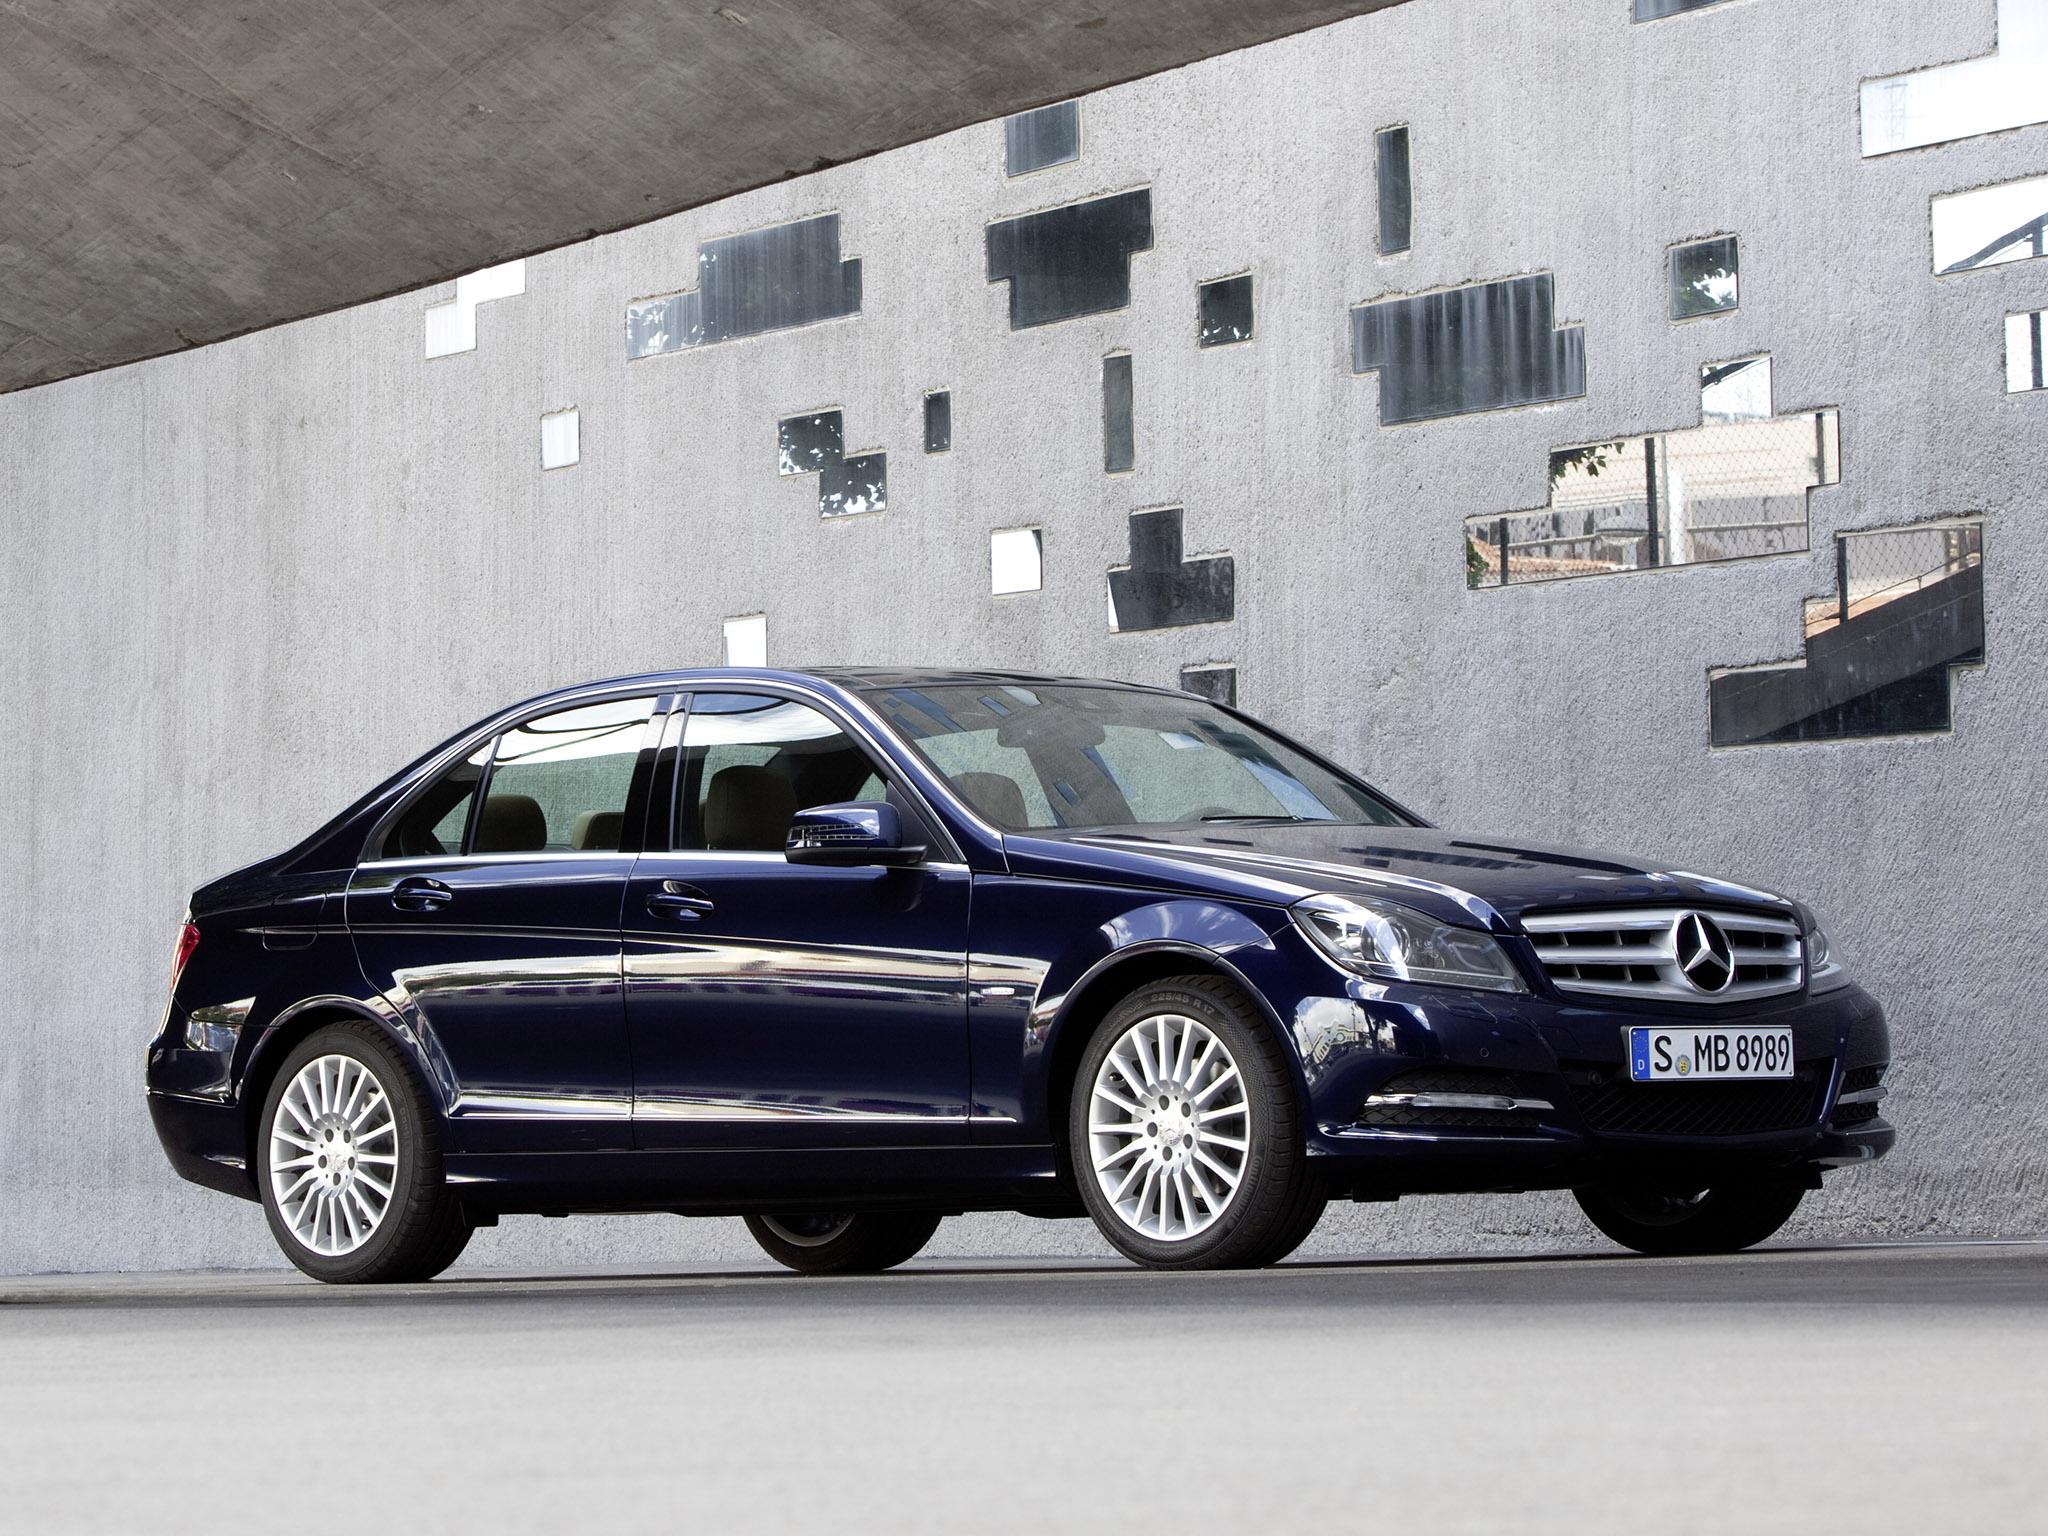 mercedes c klasse coupe c250 cdi 2011 mercedes c klasse c250 cdi sedan 2011 photo 06 car in. Black Bedroom Furniture Sets. Home Design Ideas